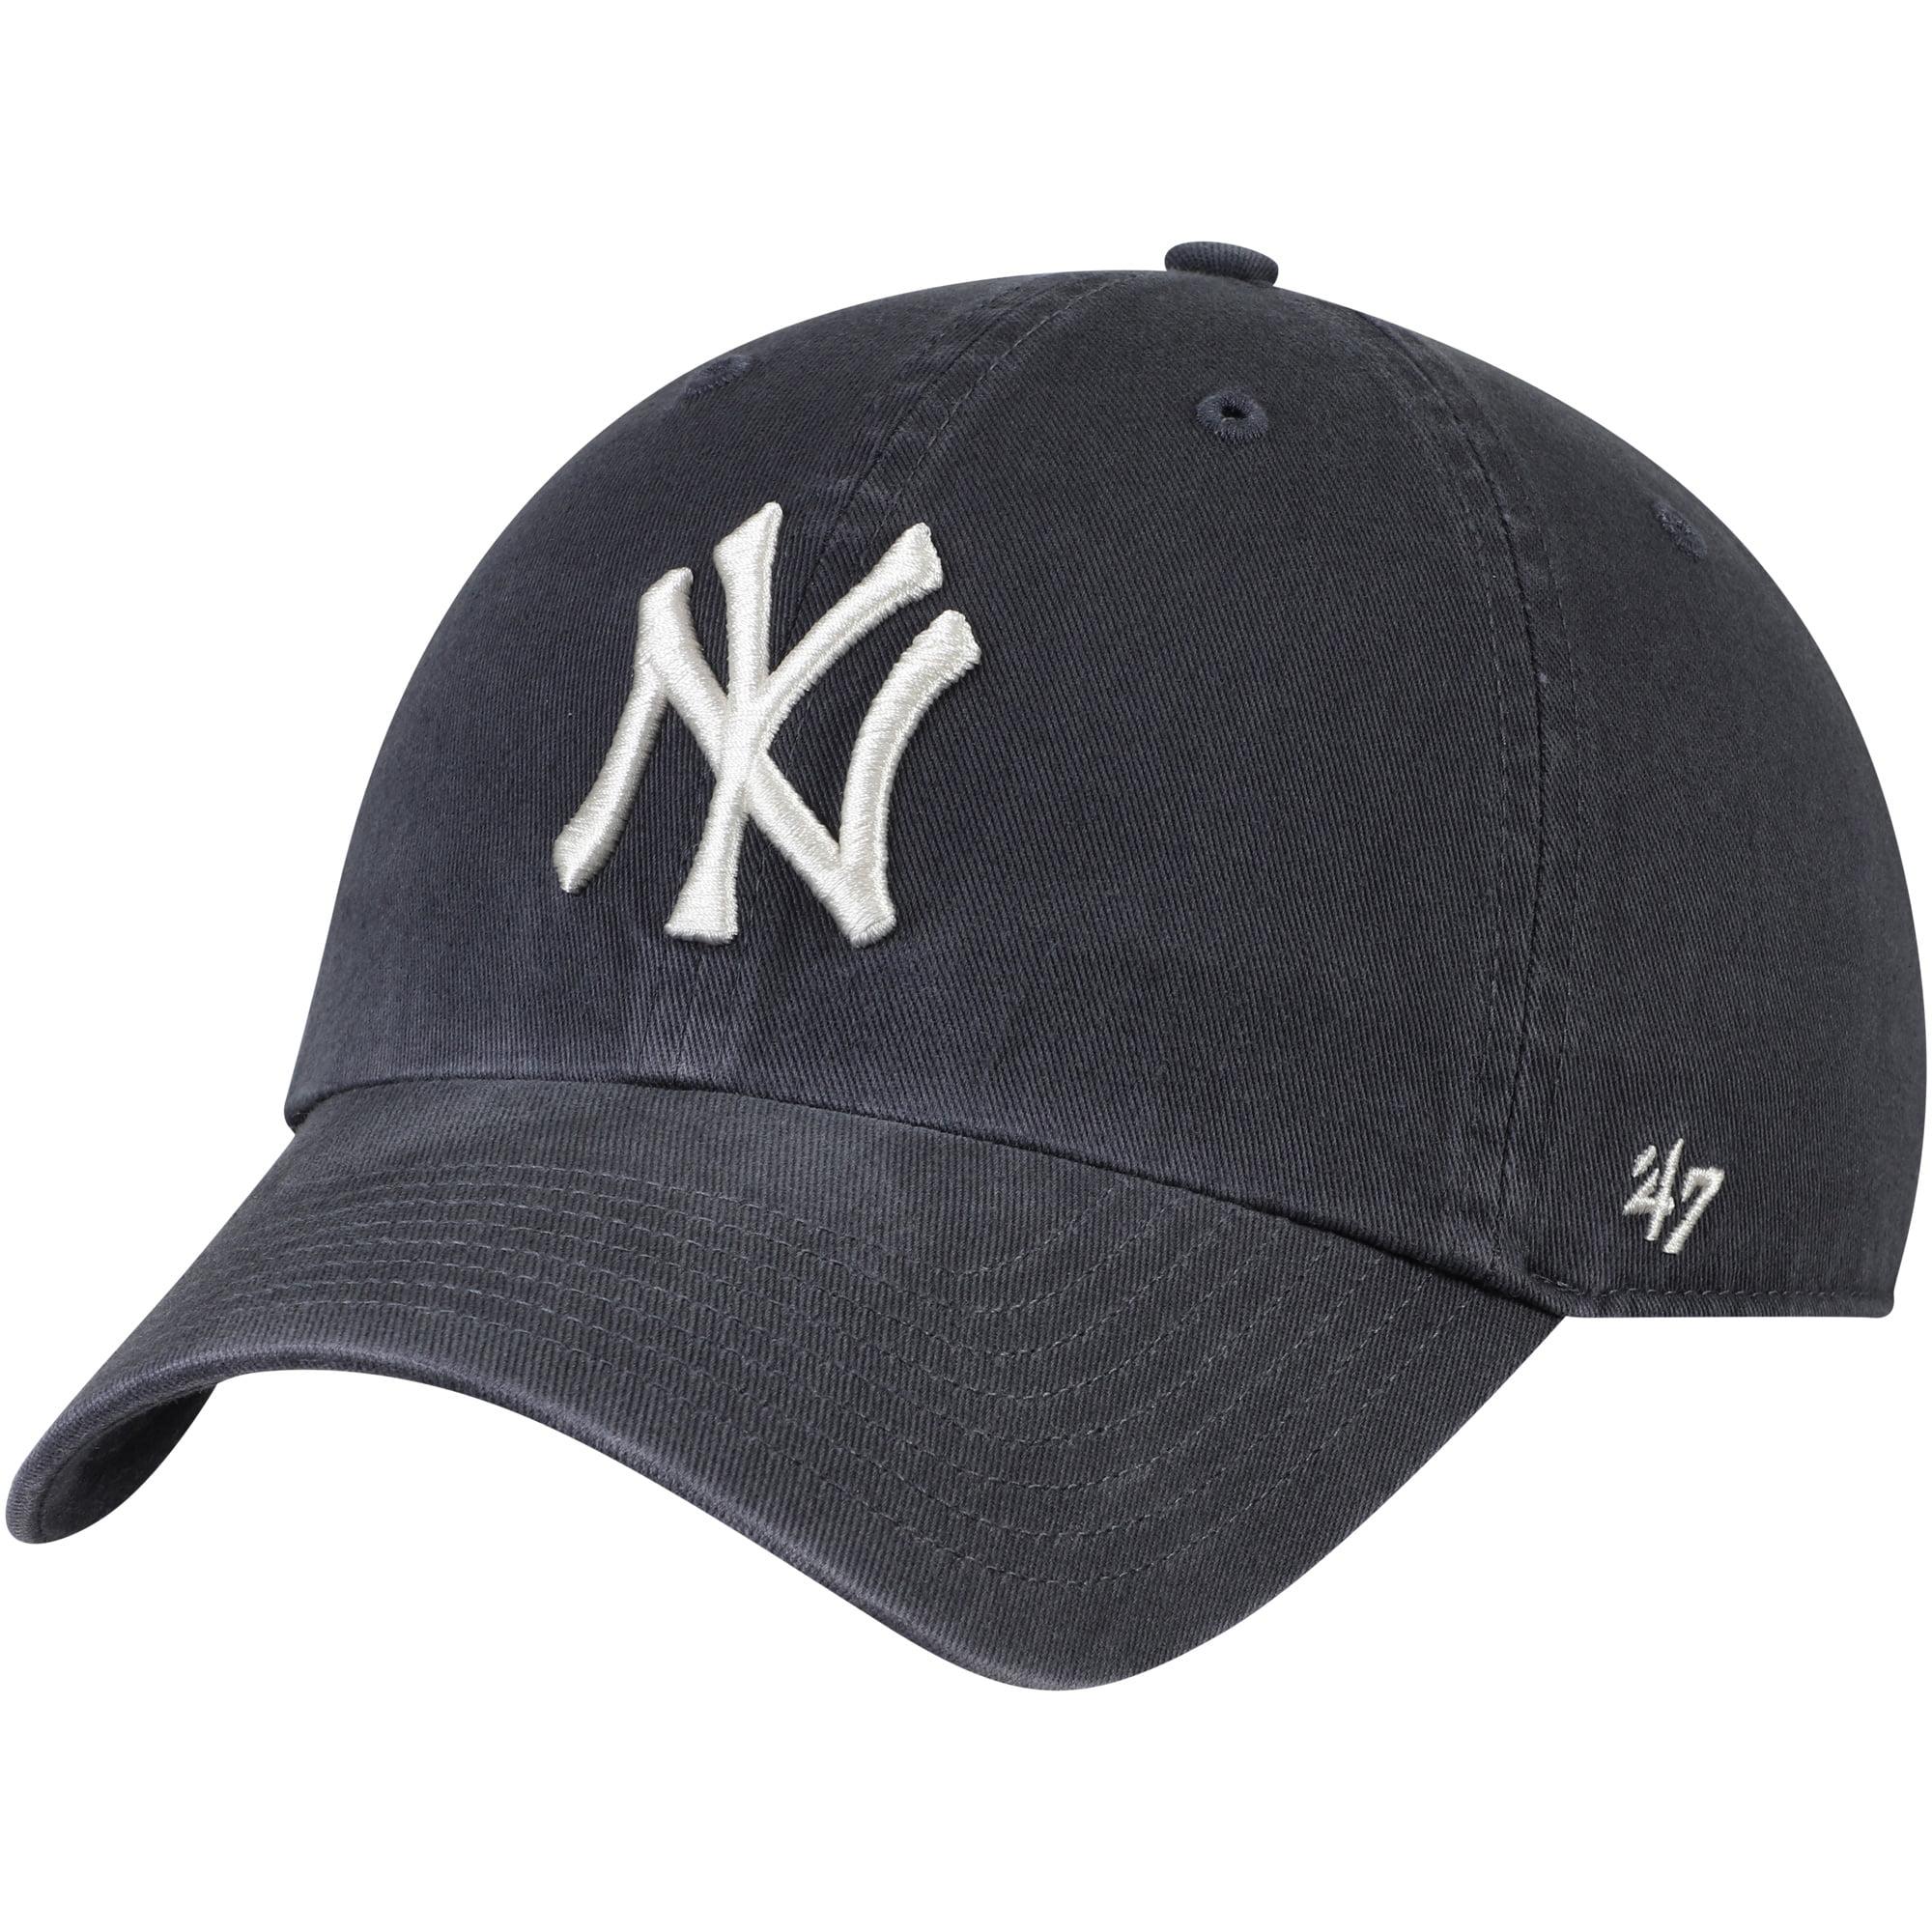 New York Yankees '47 Vintage Clean Up Adjustable Hat - Gray - OSFA